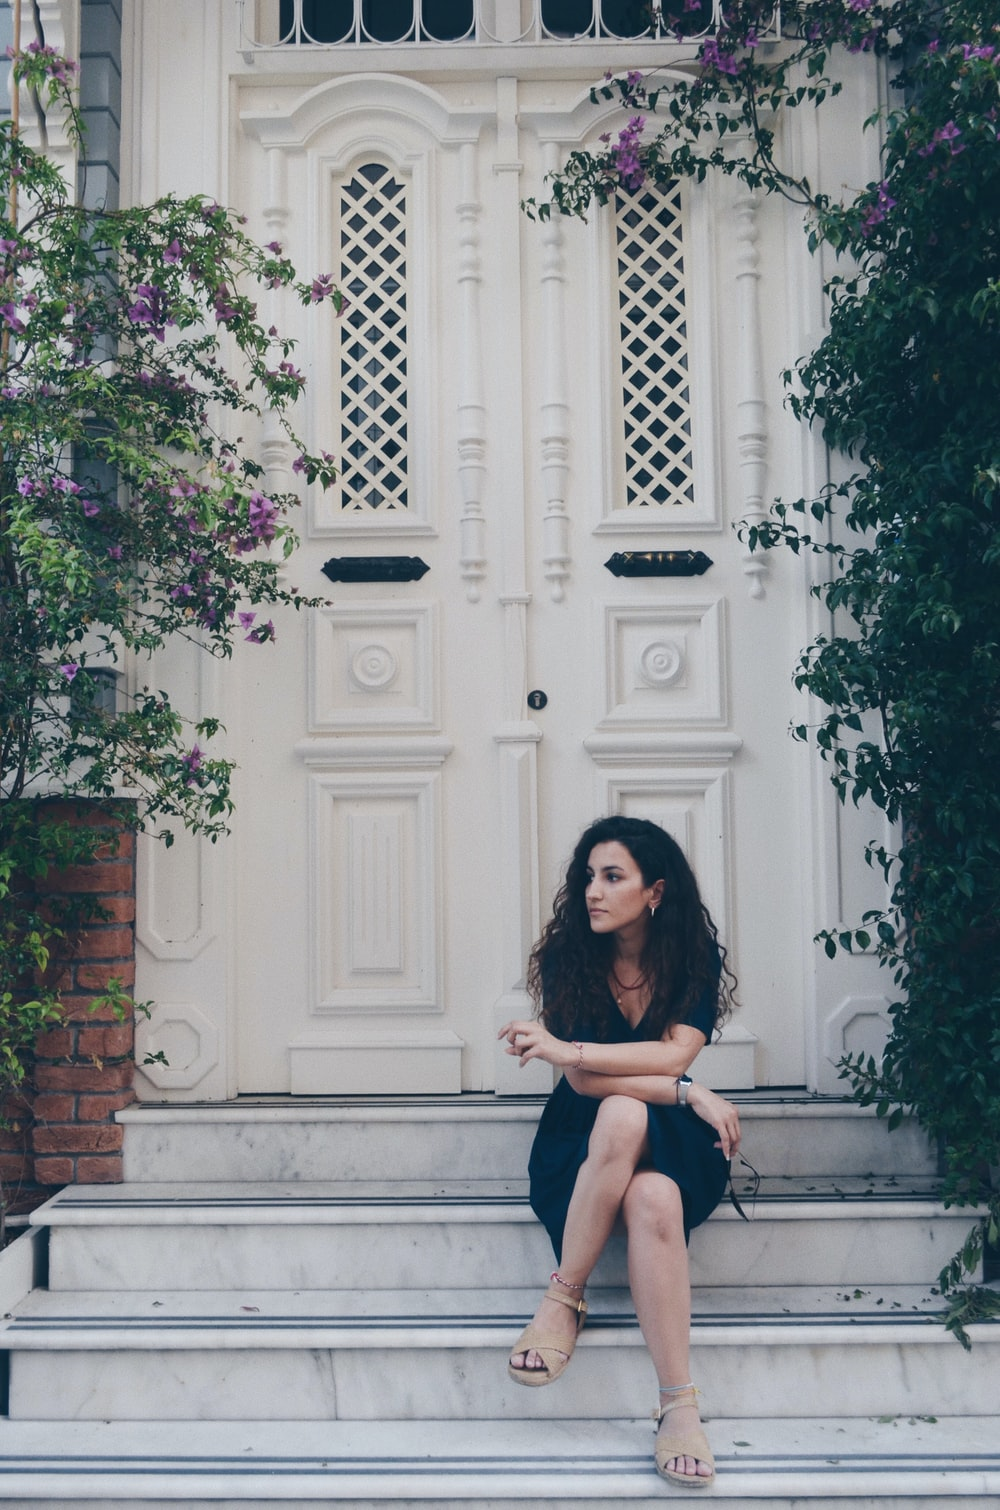 woman in black dress standing near white wooden door